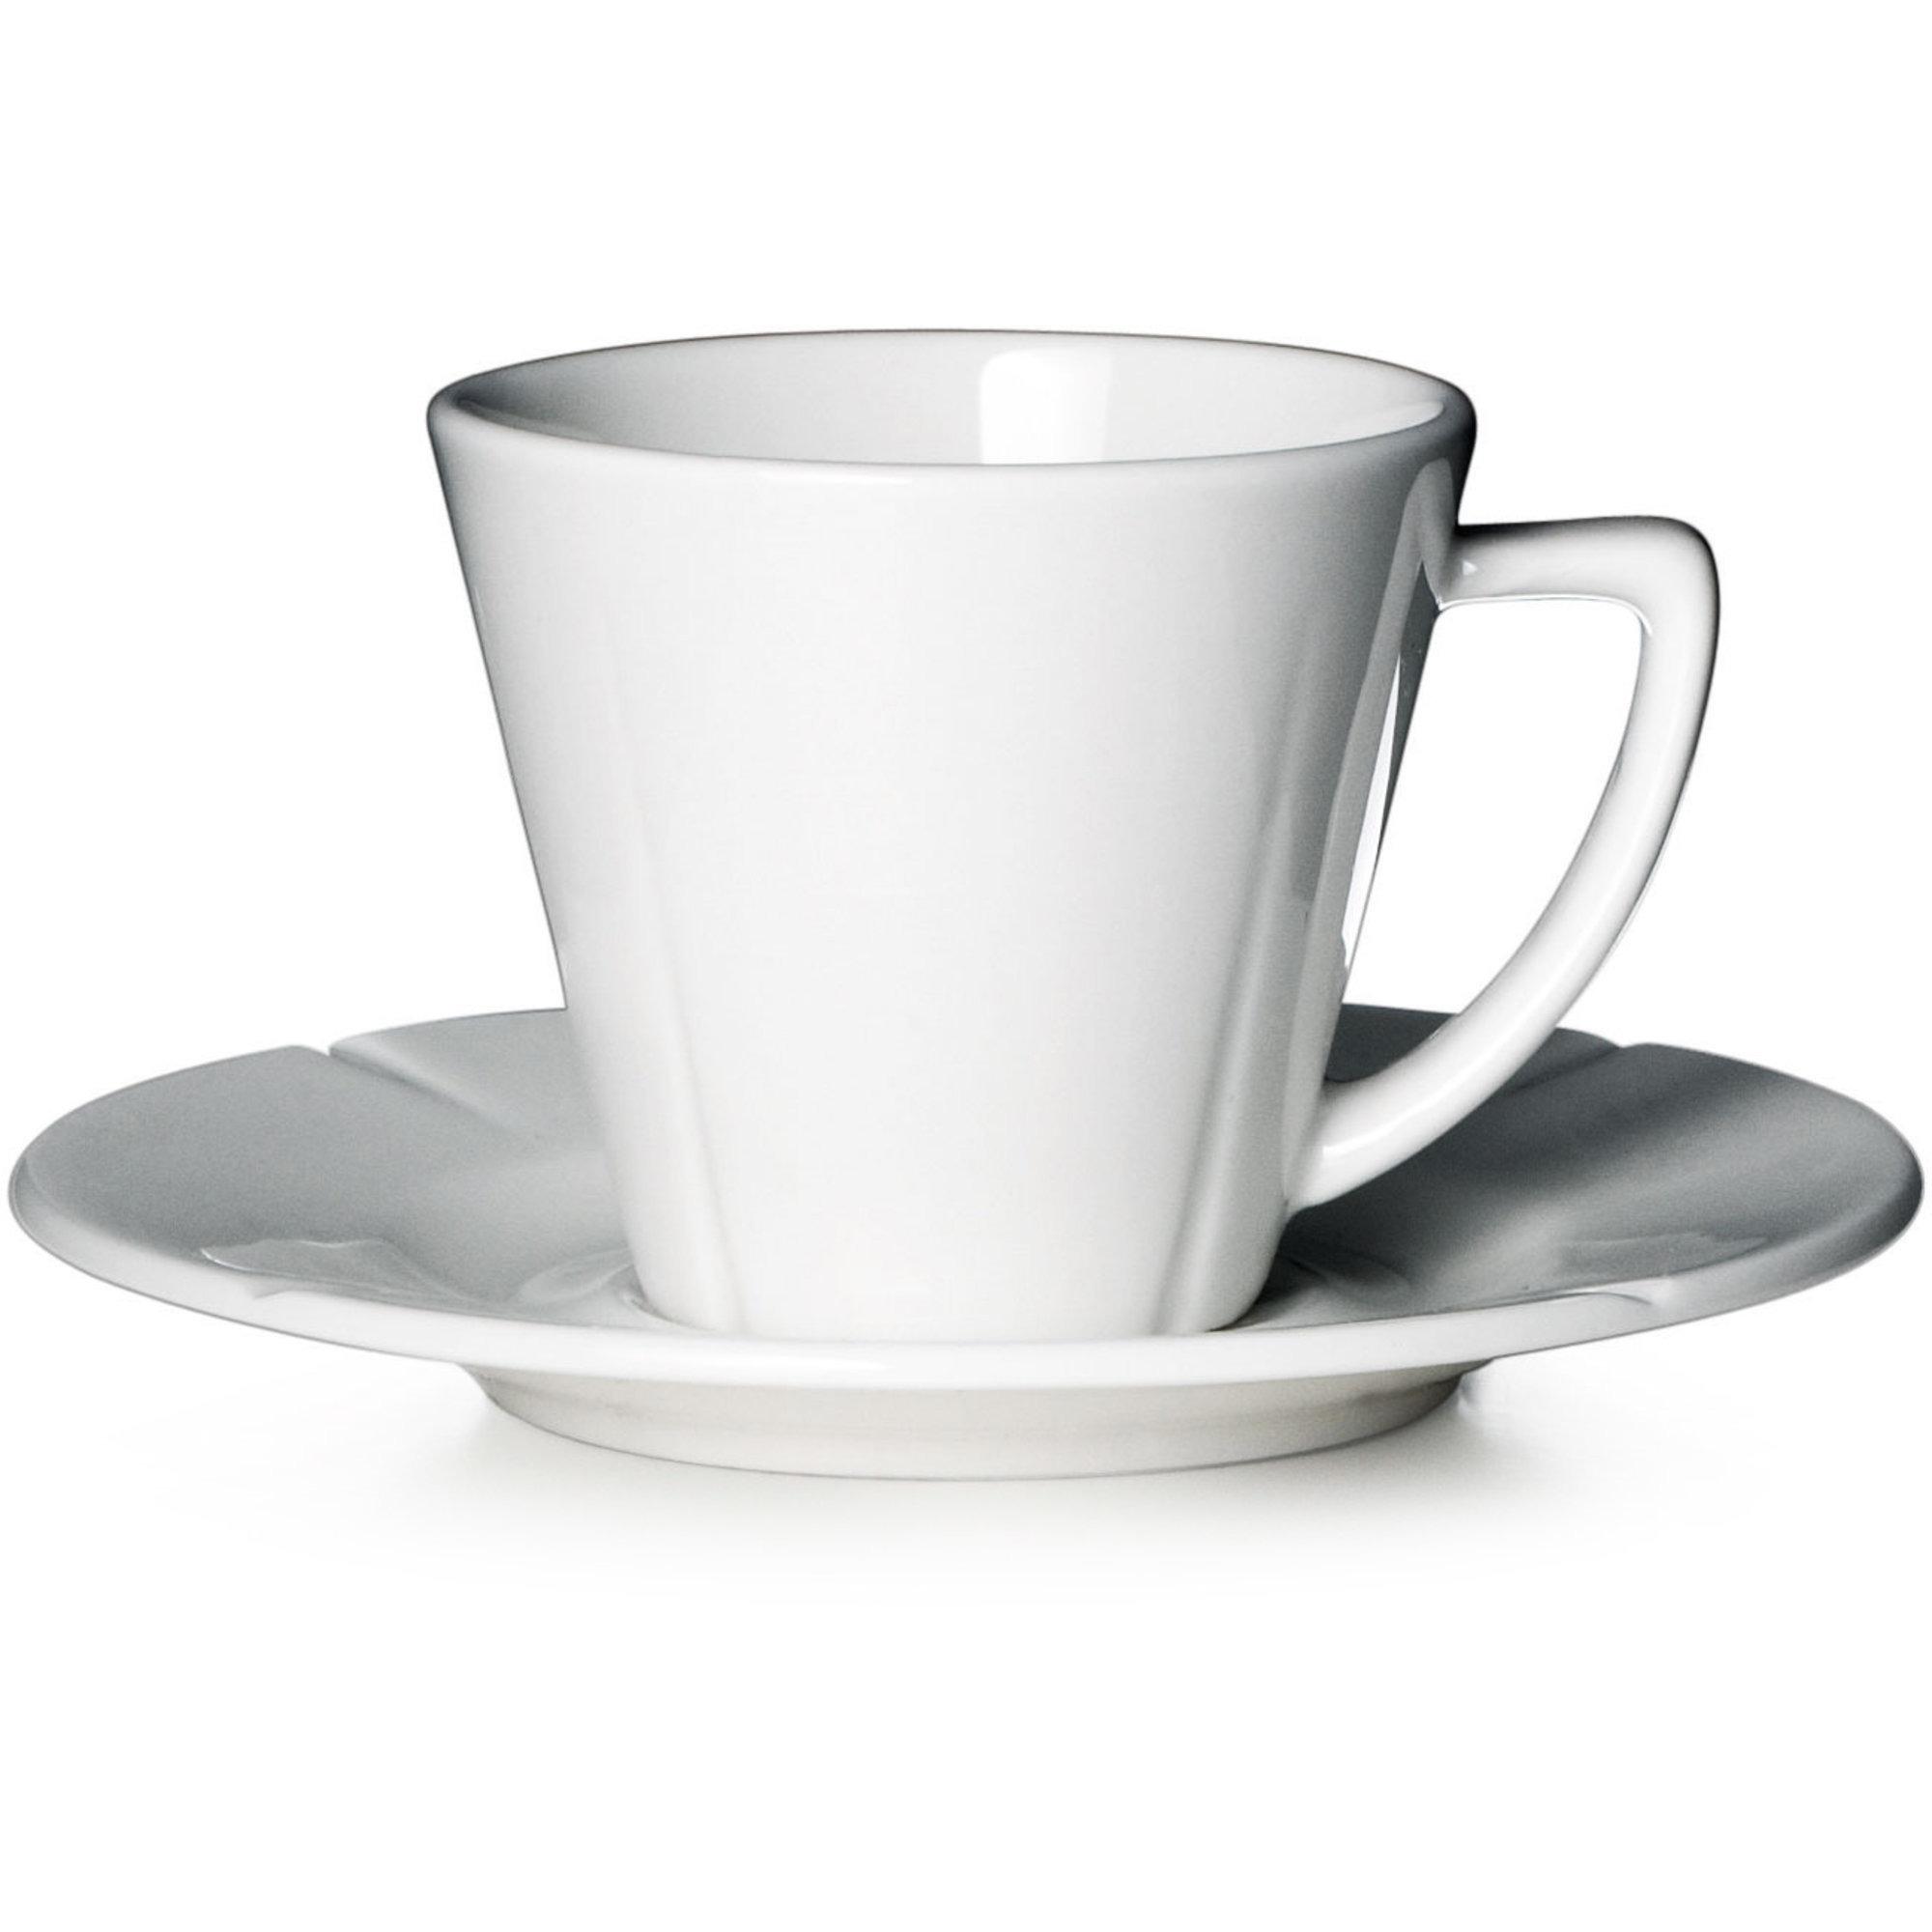 Rosendahl Grand Cru Espressokopp med fat 9 cl